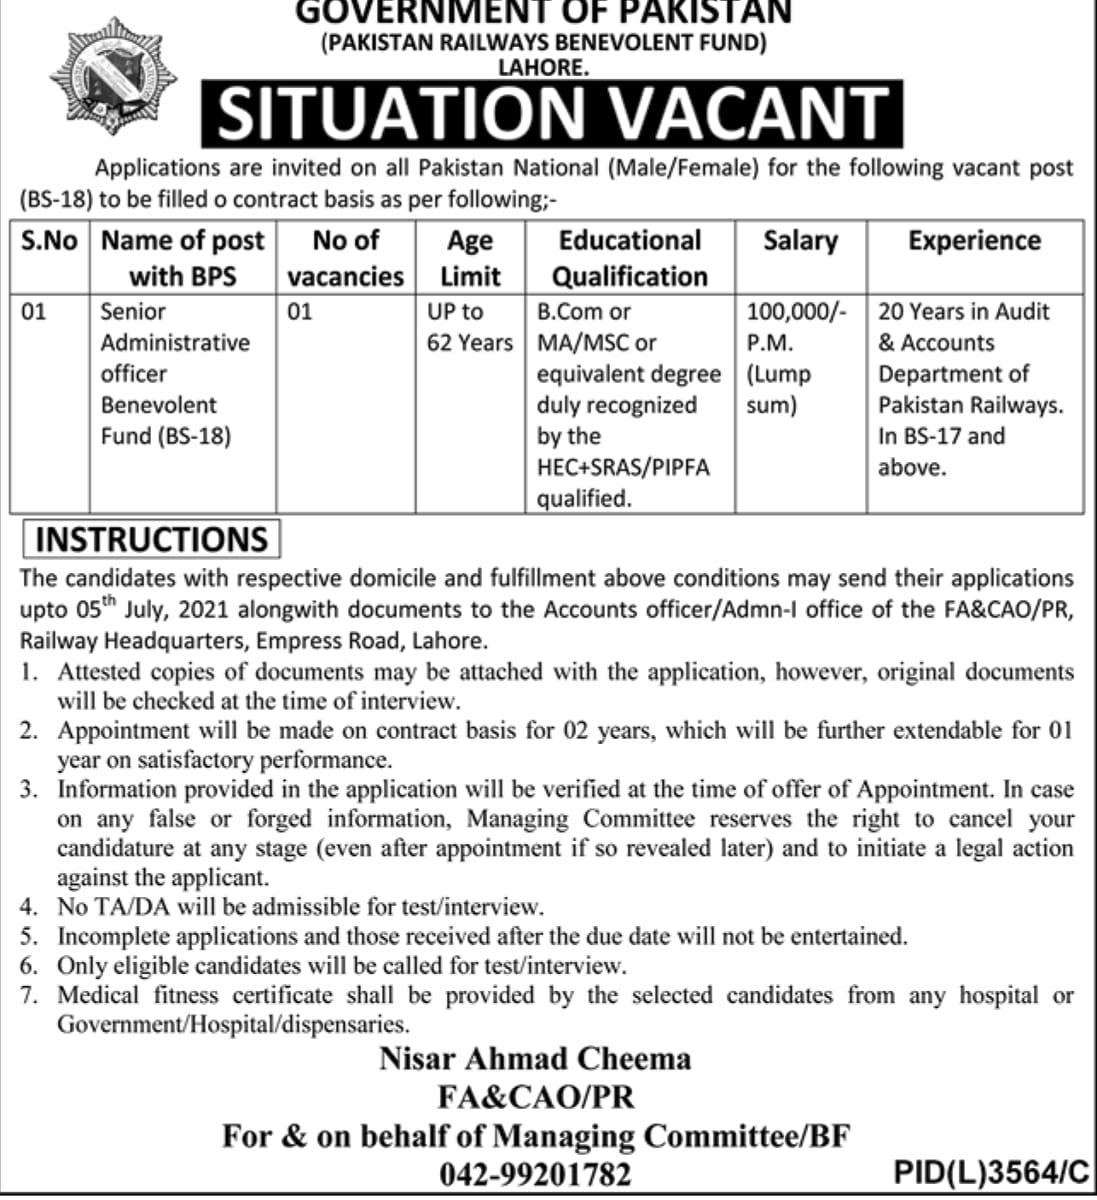 Pakistan Railway Benevolent Fund Lahore Jobs 2021